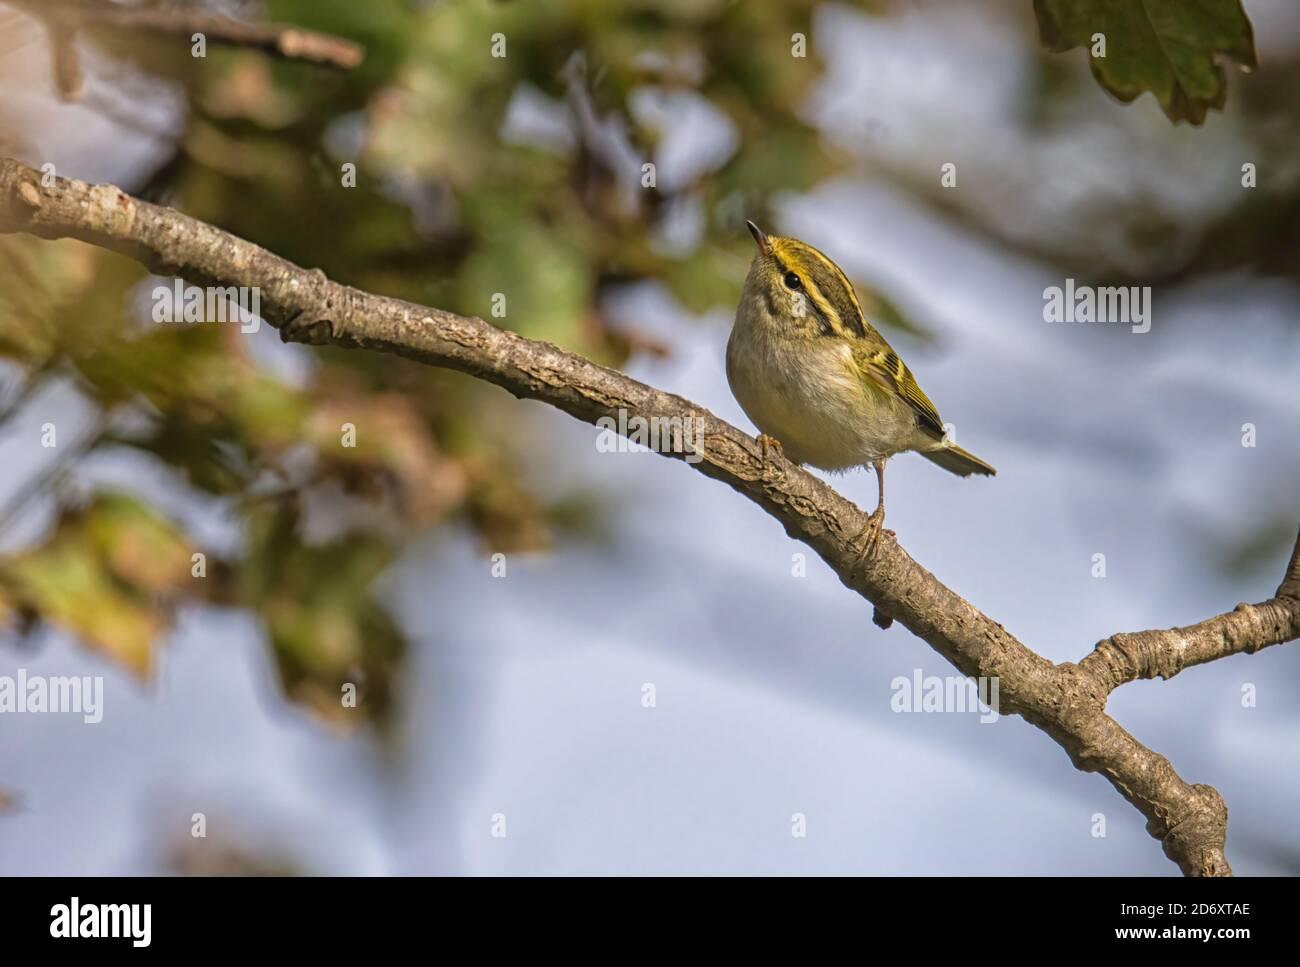 Pallas's leaf warbler Phylloscopus proregulus feeding in the tree canopy eratically Stock Photo